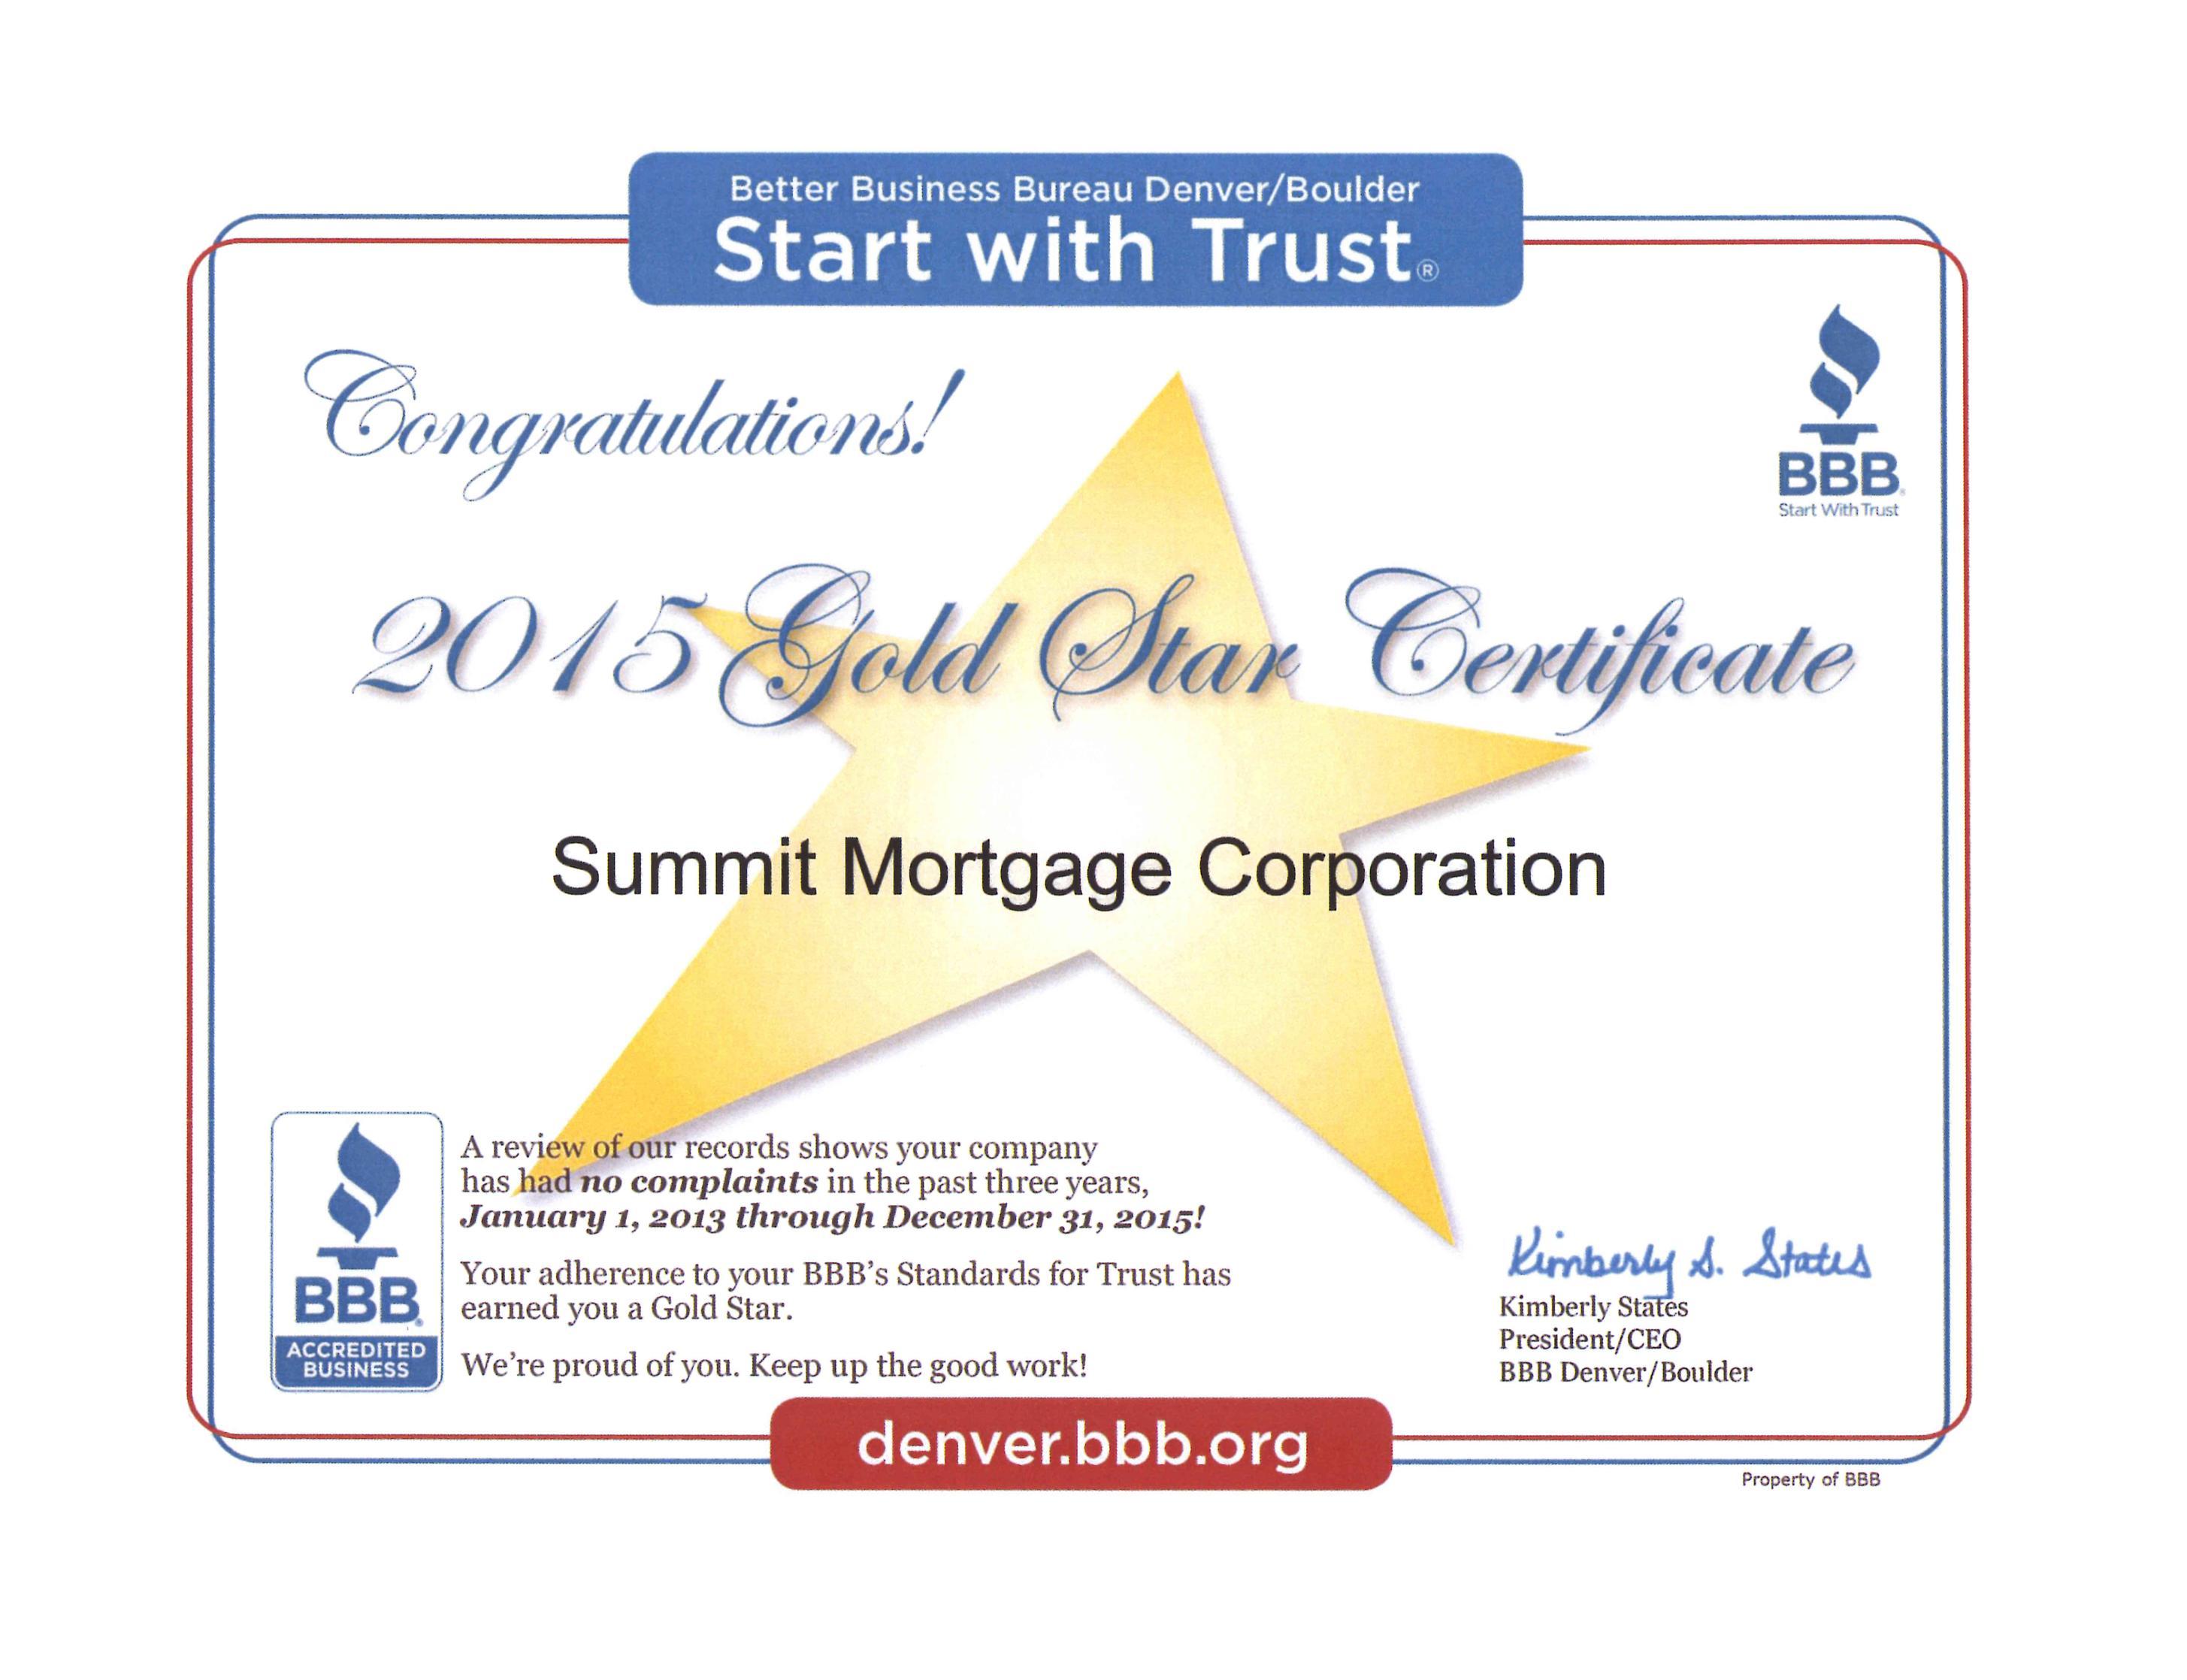 2015GoldStarCertificate-SMC